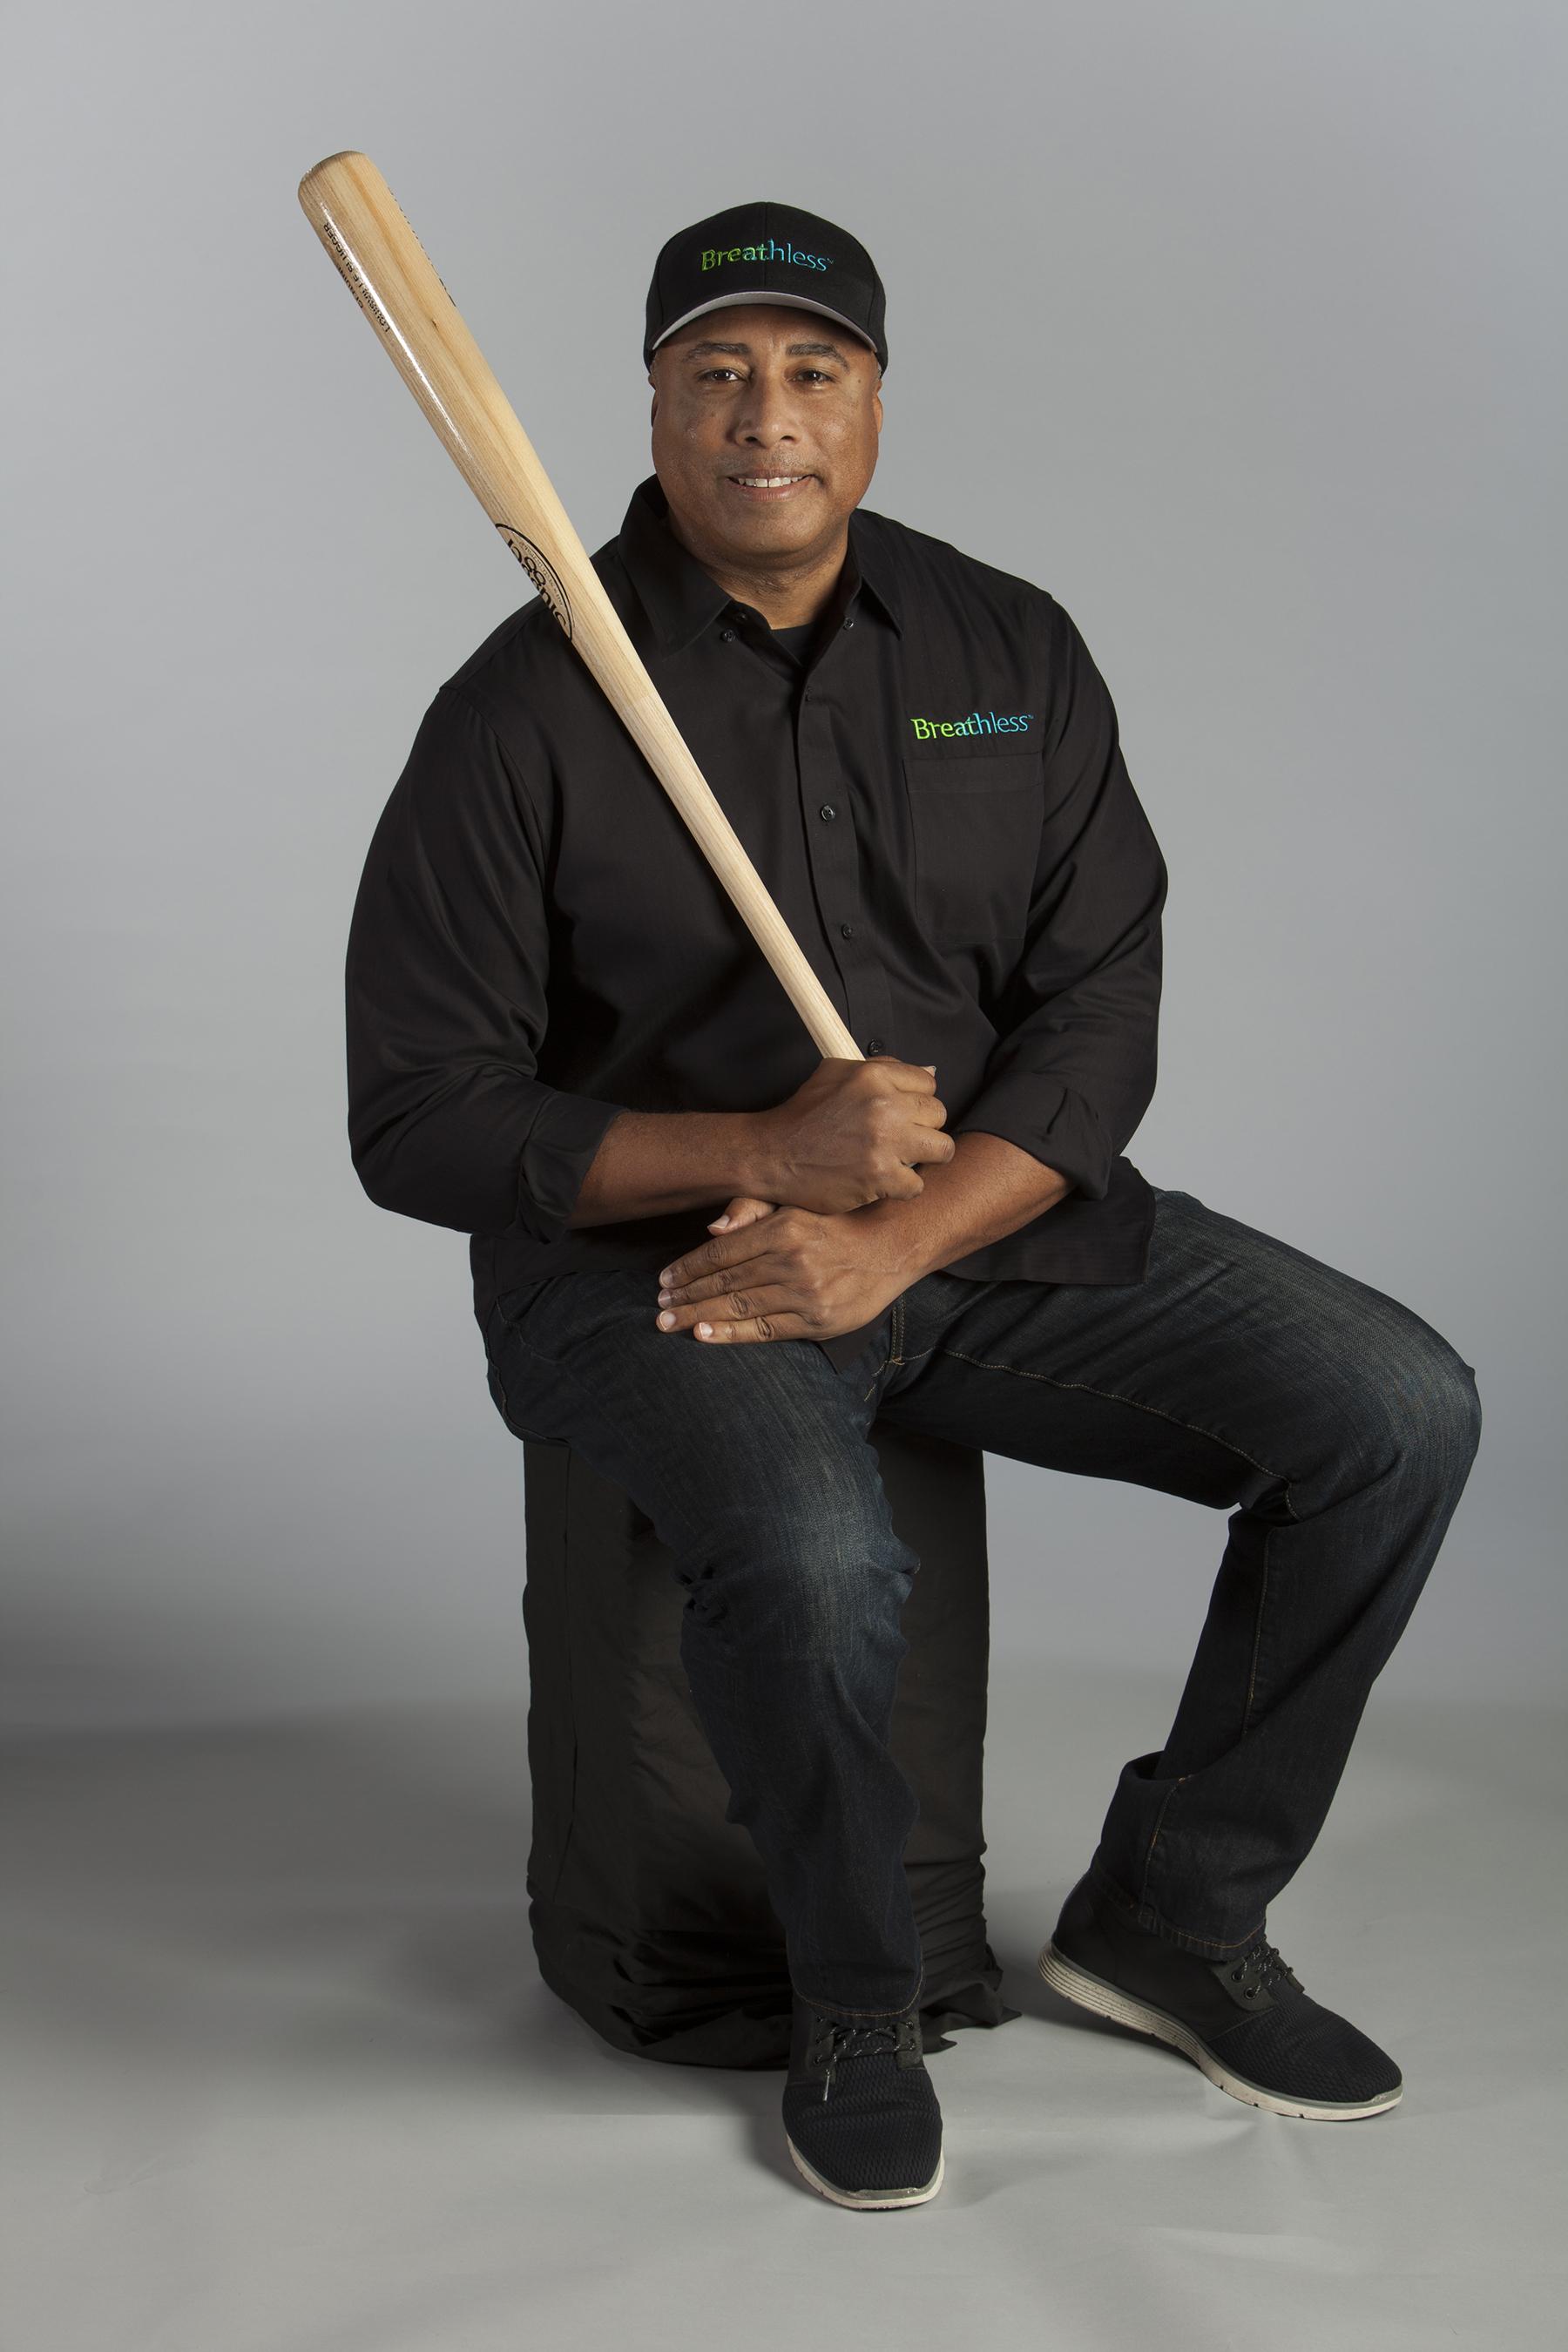 New York Yankees legend and musician Bernie Williams